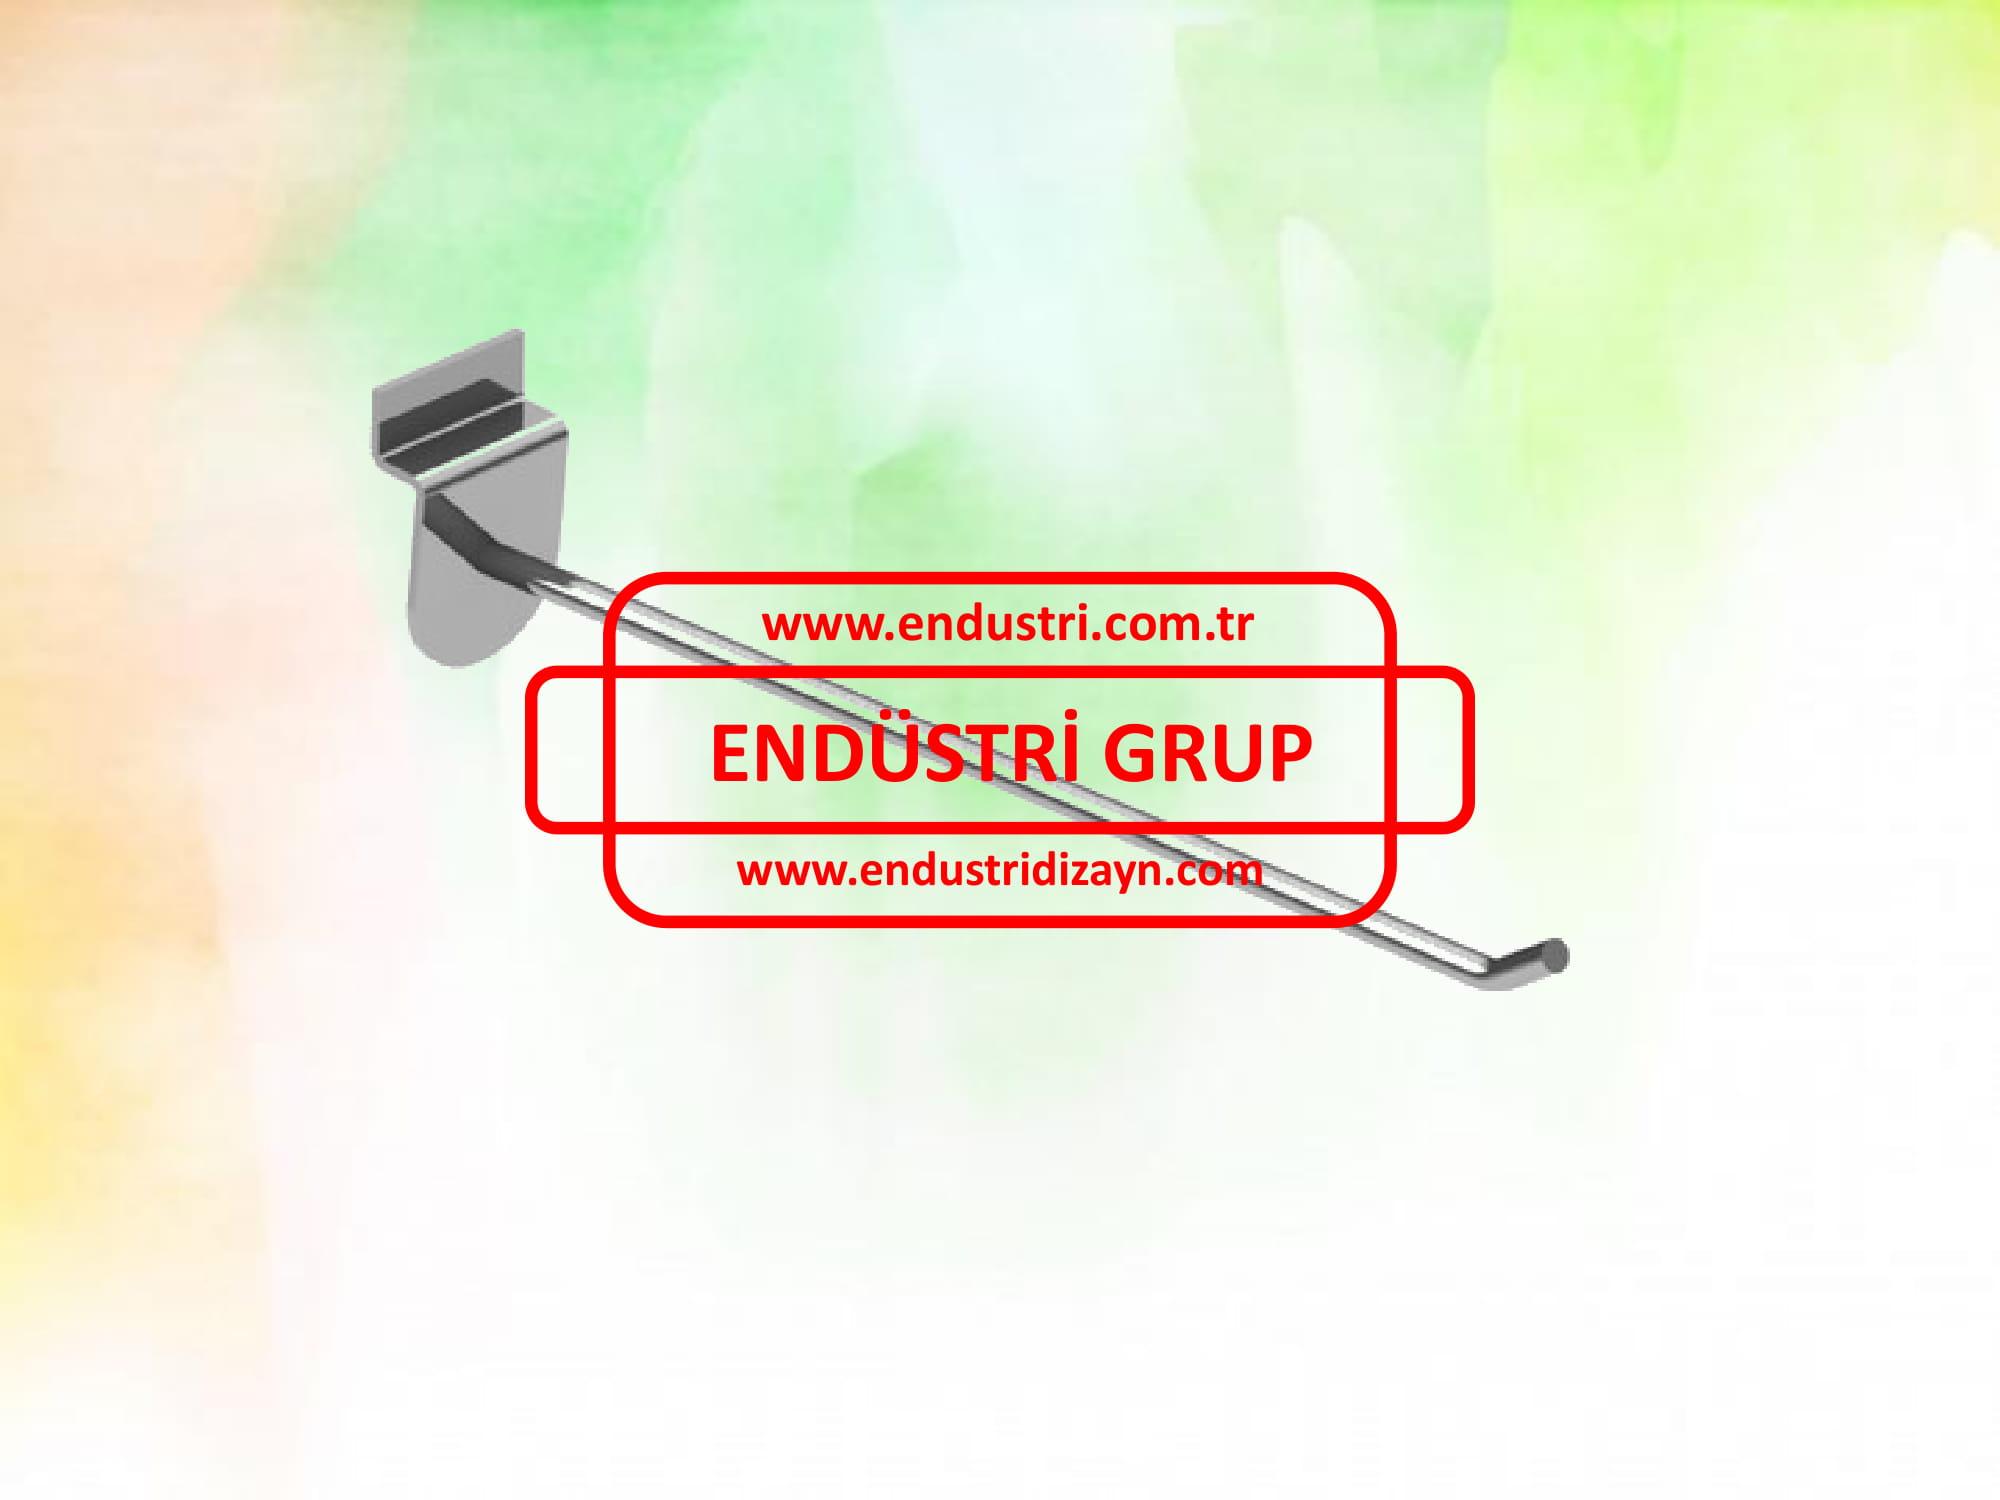 paslanmaz-metal-personel-urun-takim-alet-malzeme-aski-asma-panosu-paneli